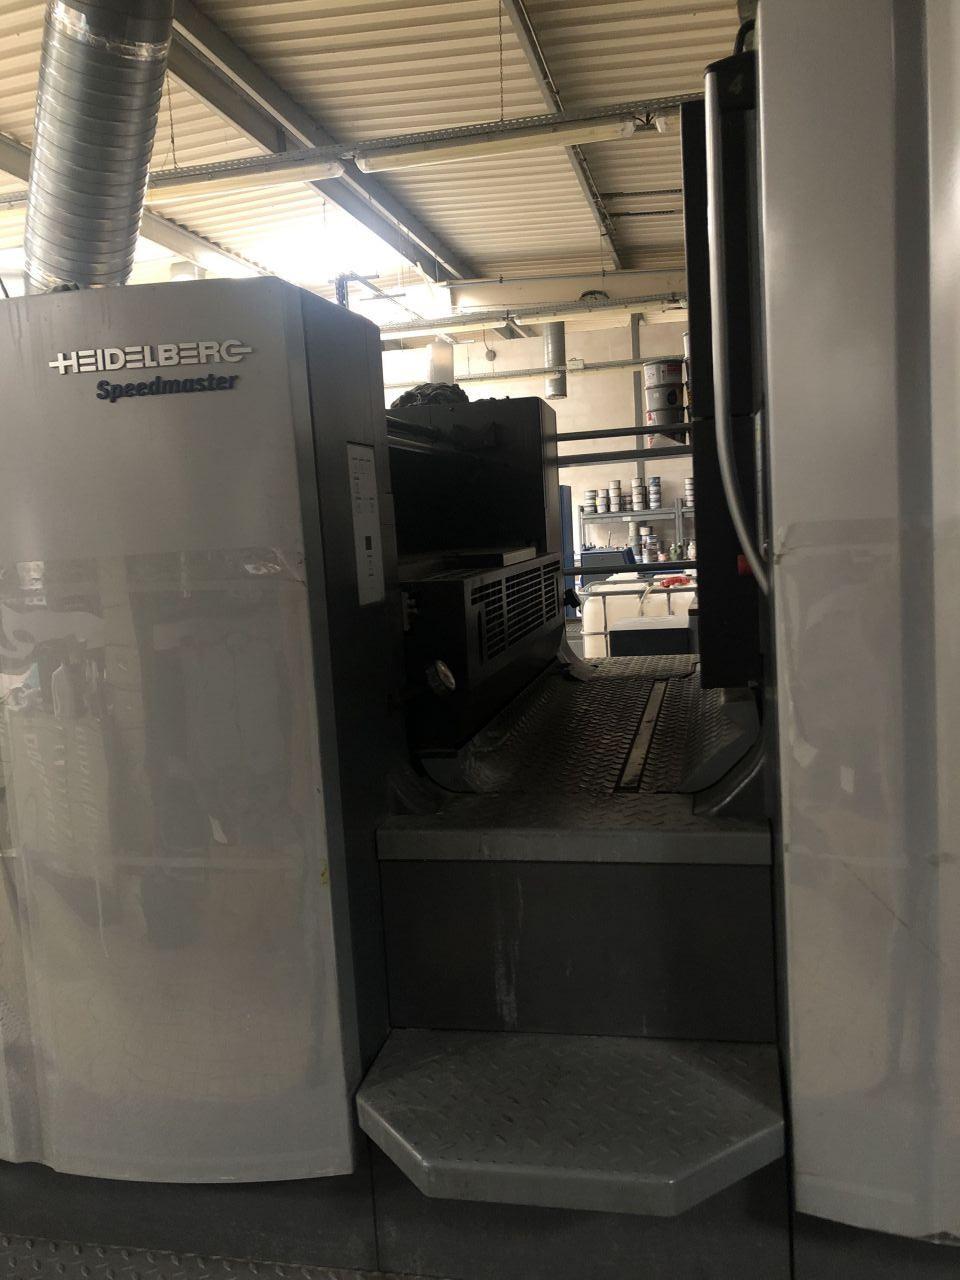 HEIDELBERG CX 102 4 L, Year : 2015, ref.67613 | www.coci-sa.com/en | 67613n_9.jpg